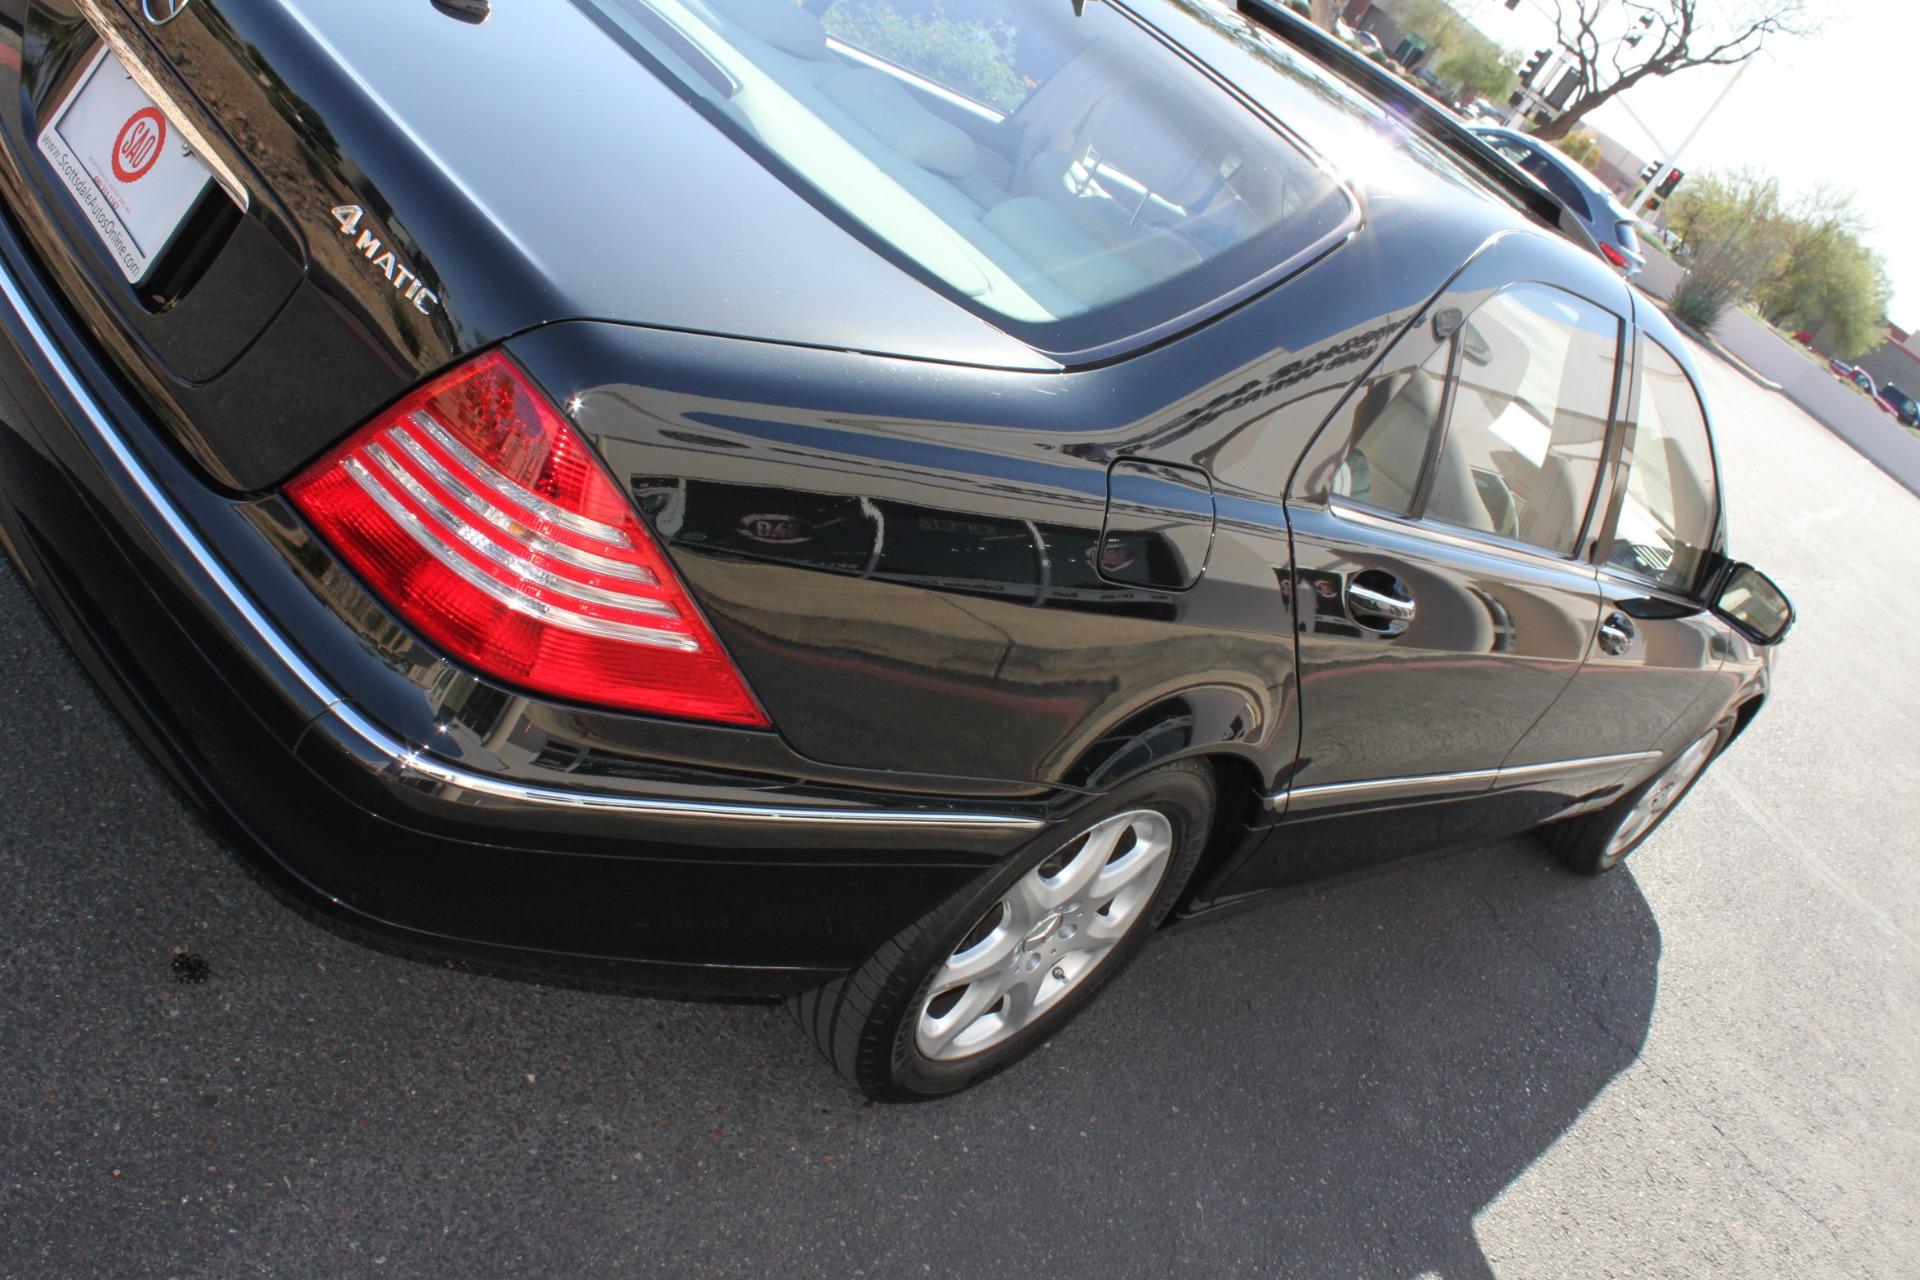 Used-2006-Mercedes-Benz-S-Class-43L-Camaro